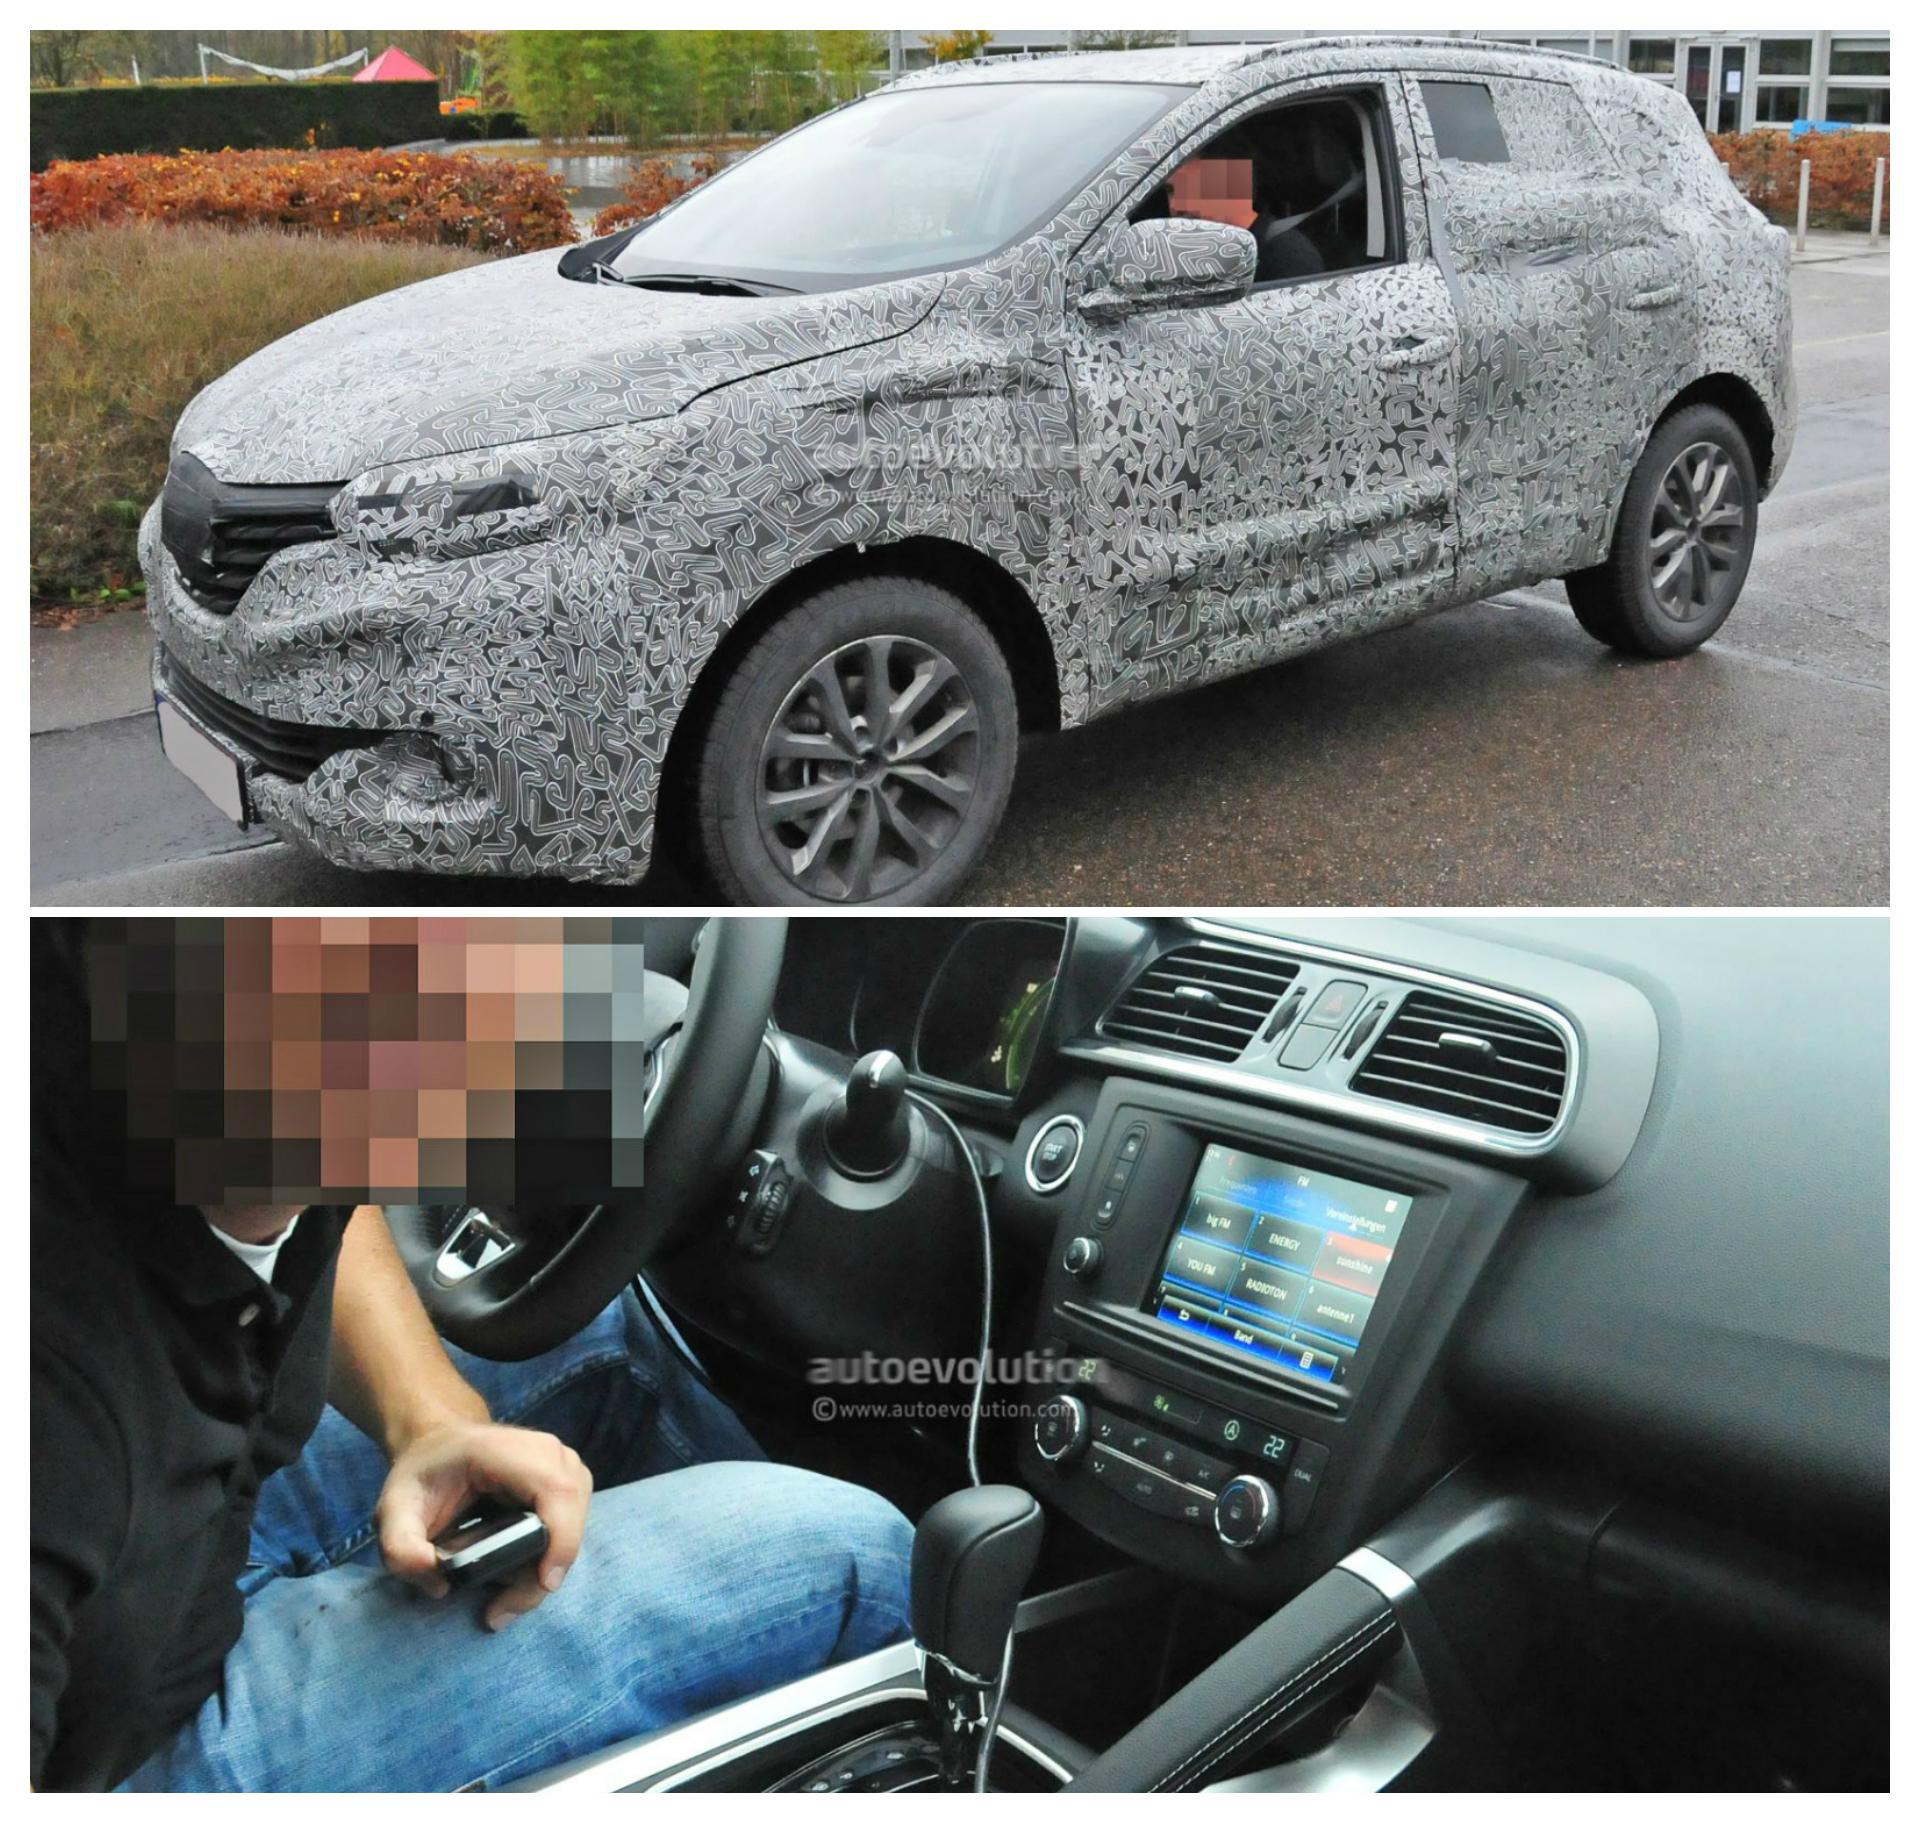 2015 Renault Koleos Crossover Spyshots Reveal Interior